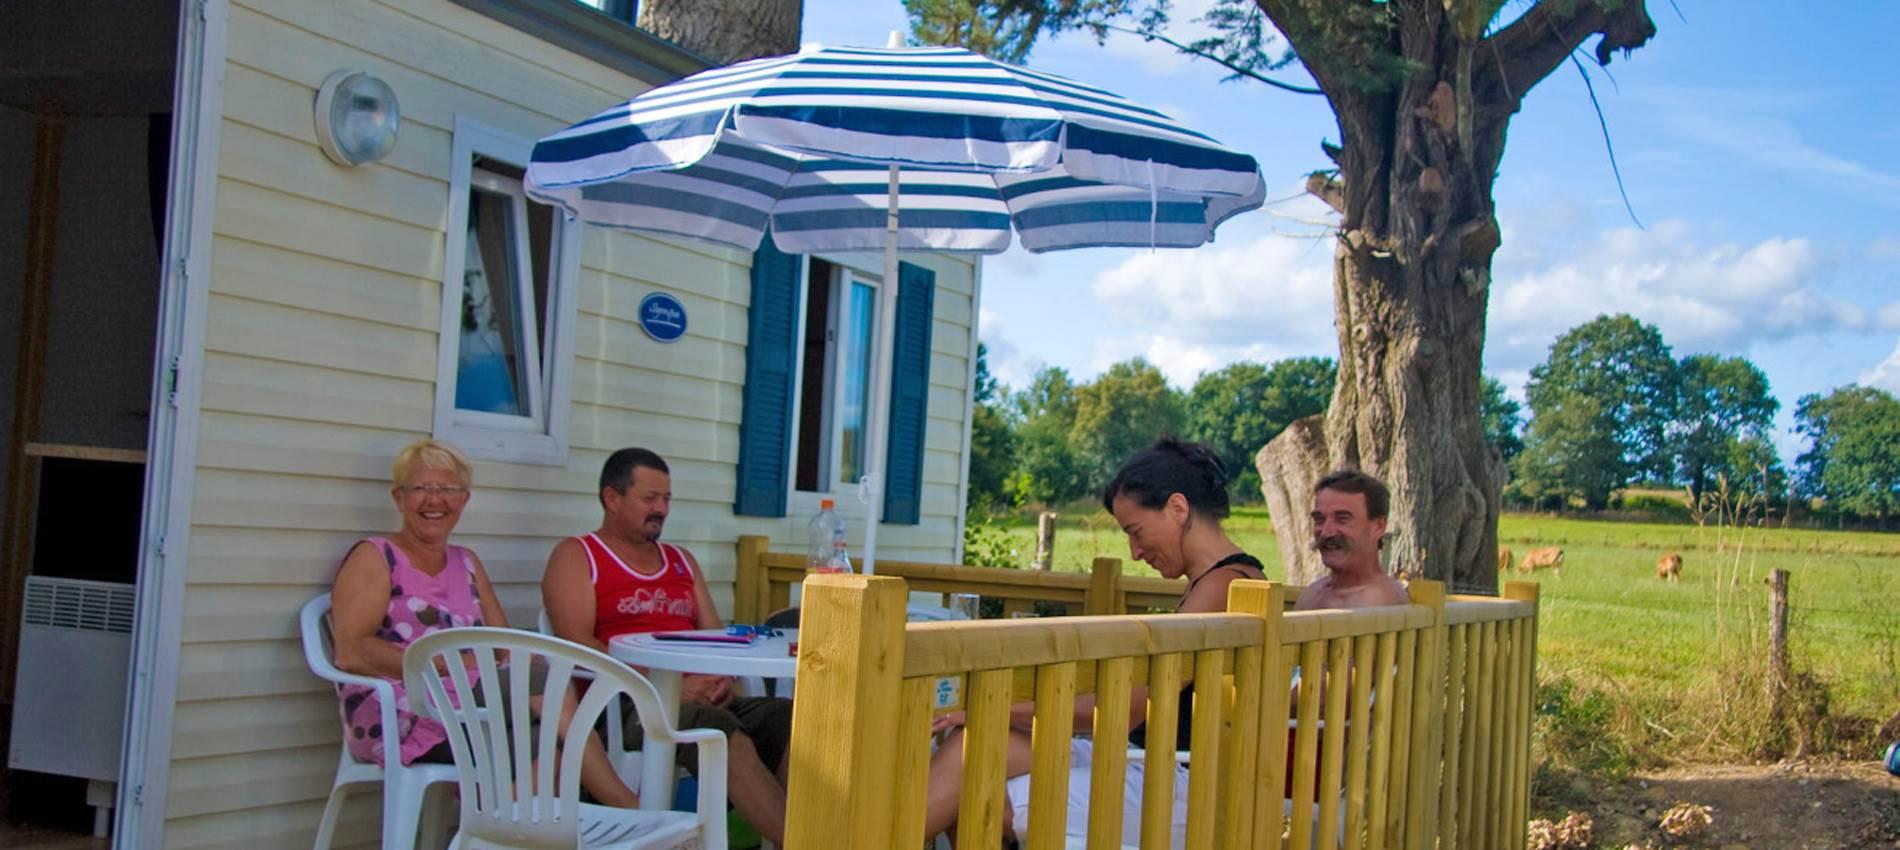 Camping-Le-Moulin-de-Cantizac-Sene-Morbihan-Bretagne-Sud © Camping-Le-Moulin-de-Cantizac-Sene